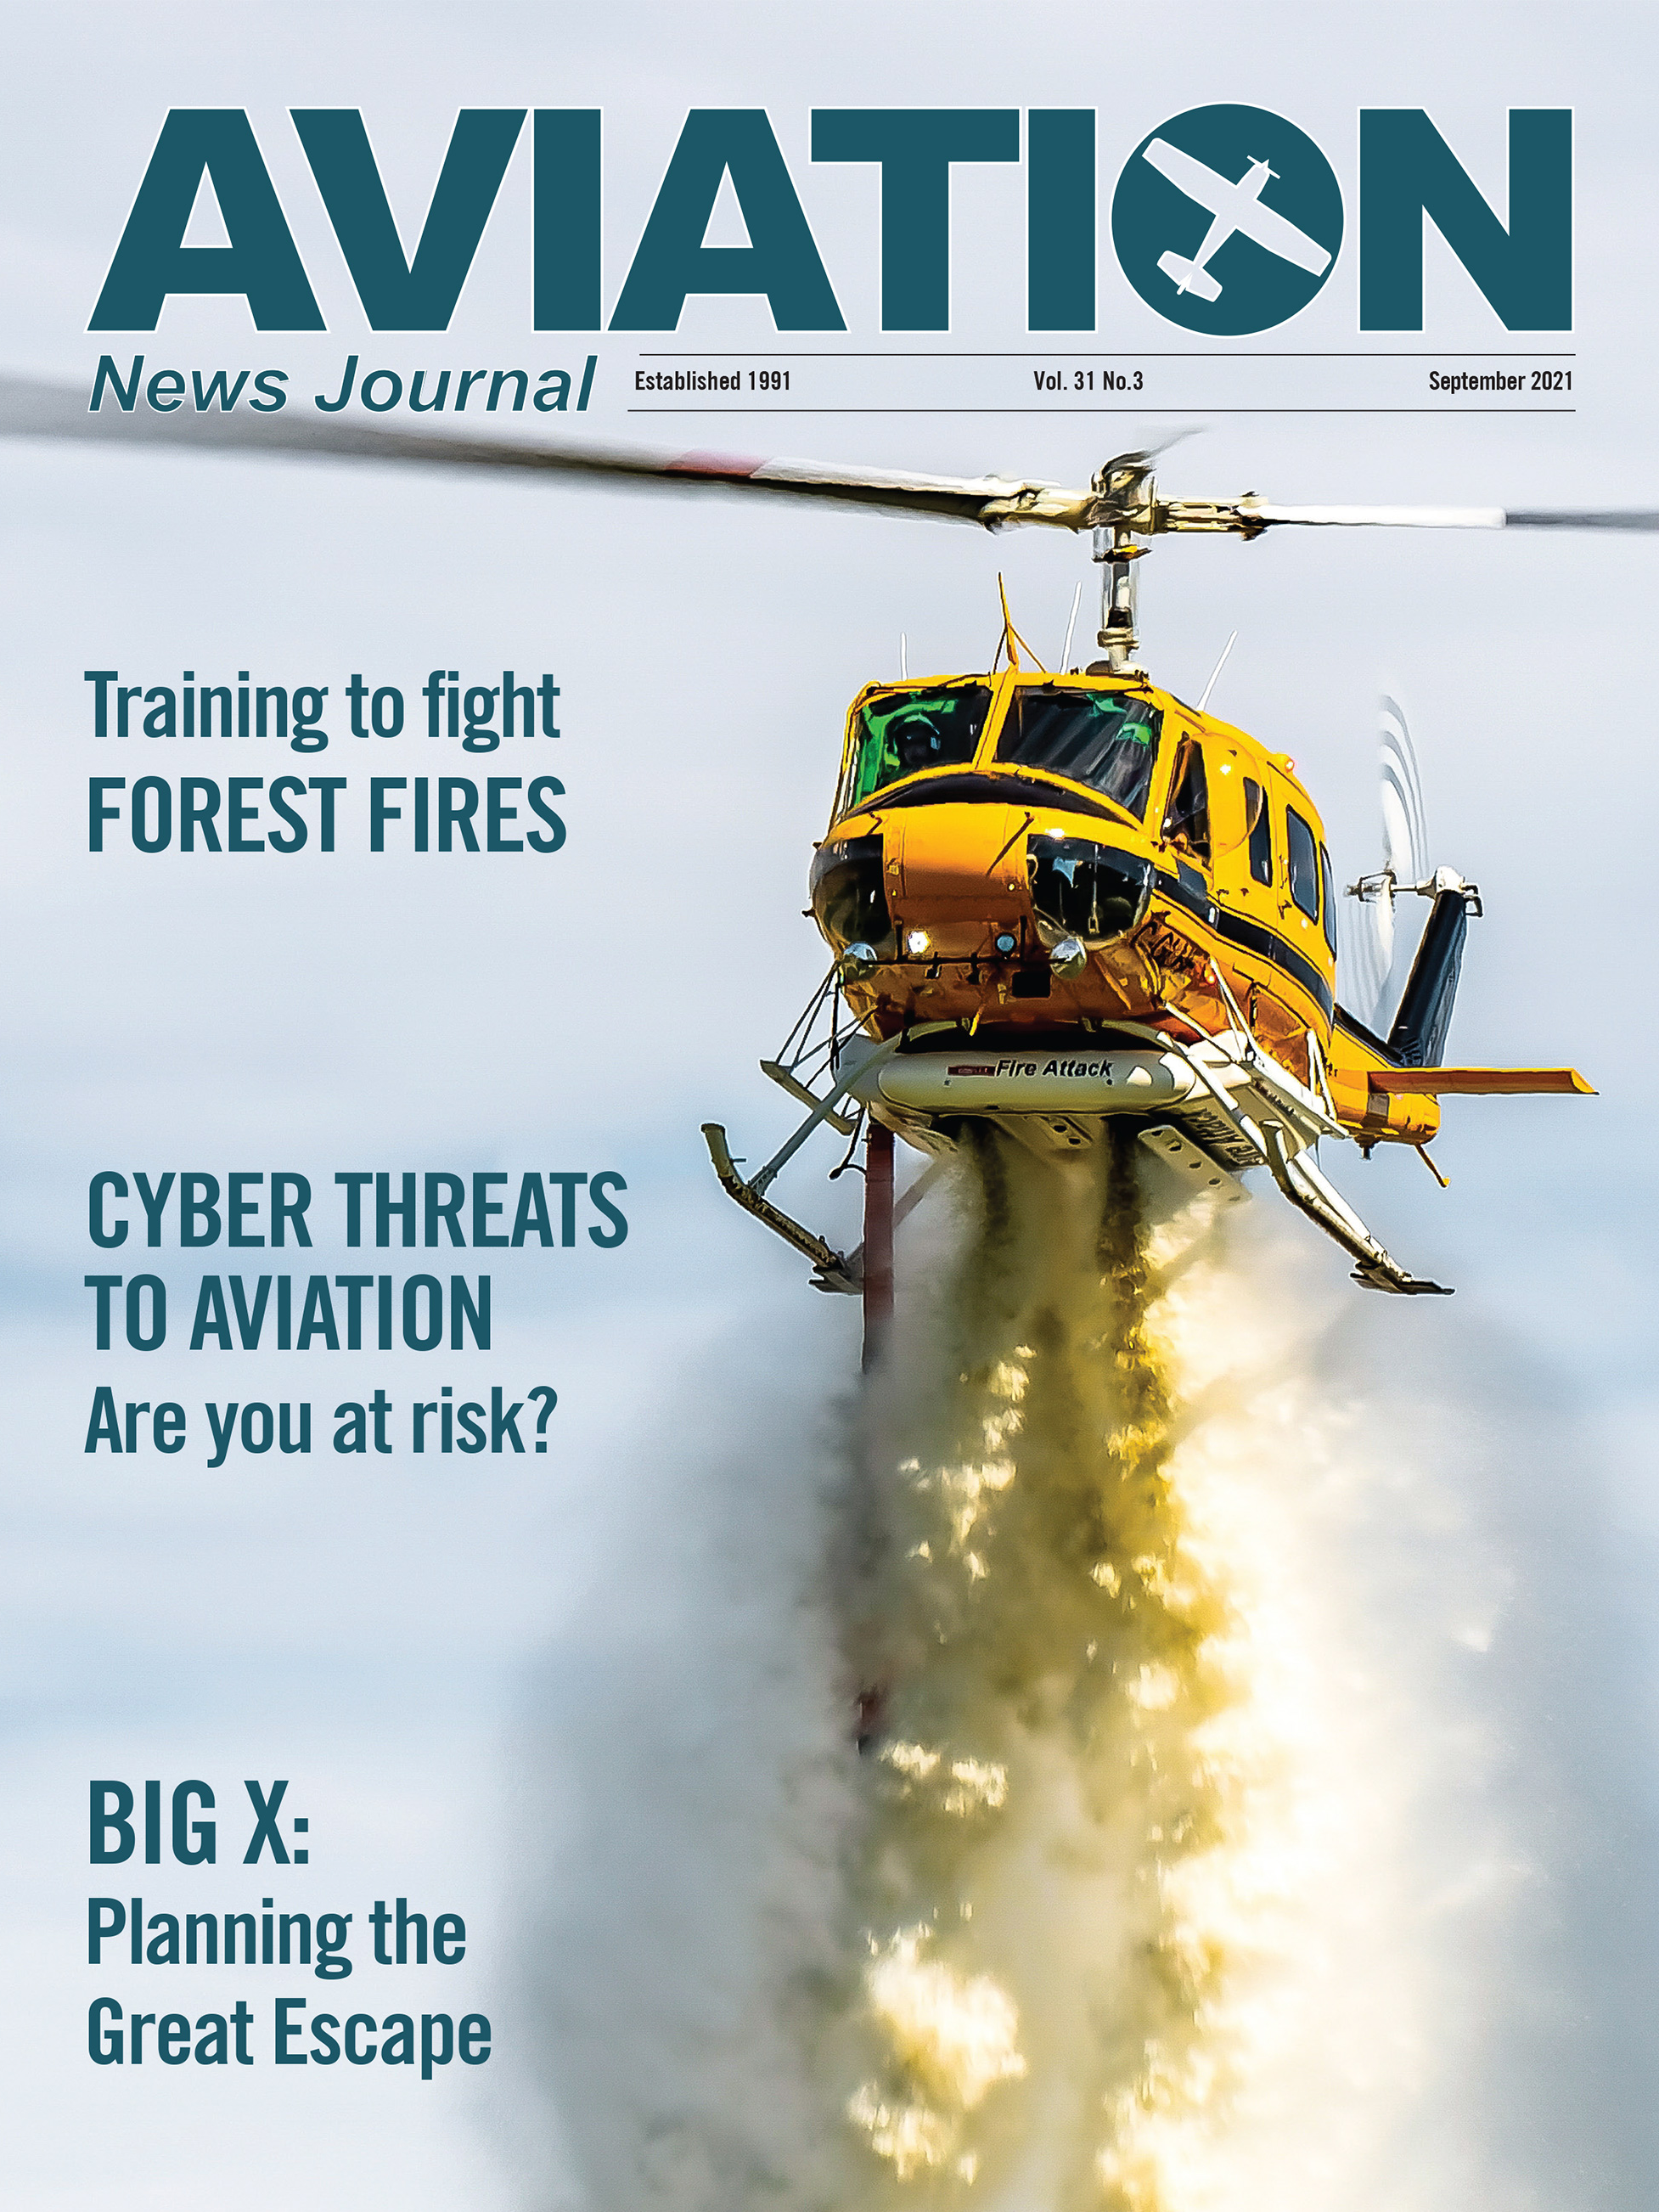 Aviation News Journal - September 2021